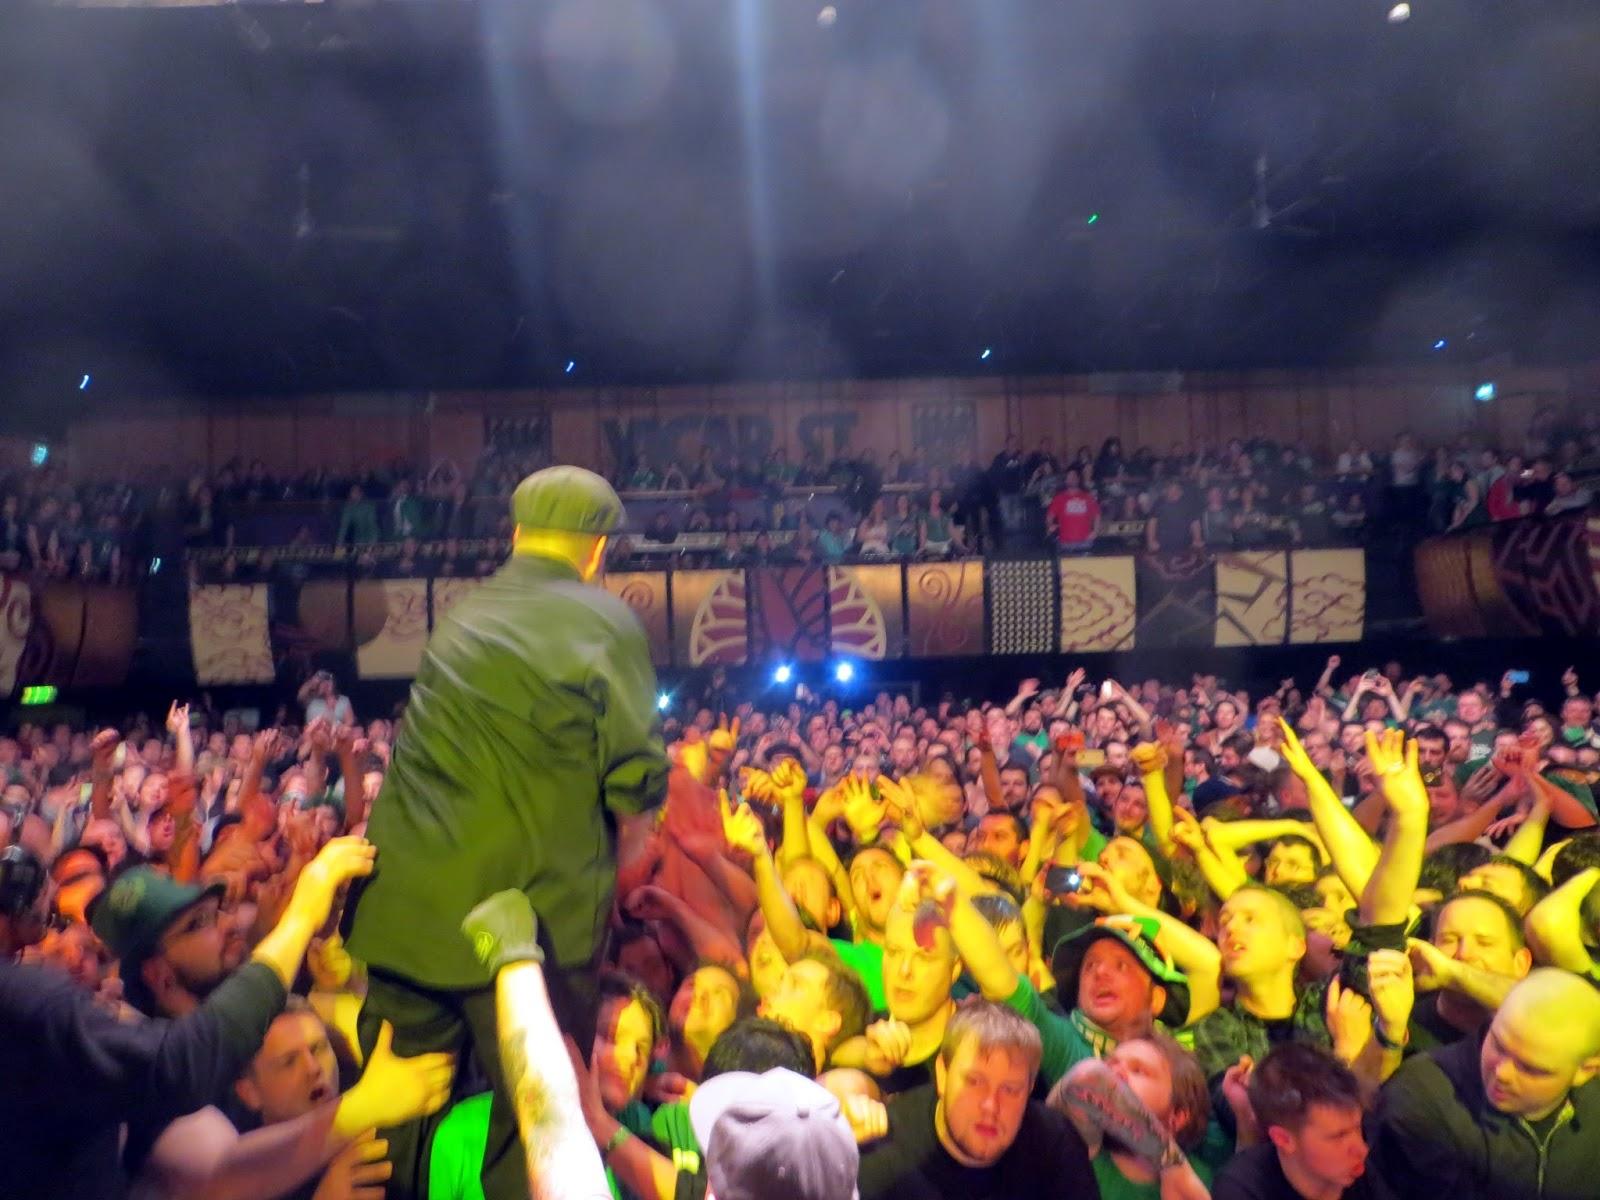 Dublin, Ireland, Eire, St Patrick's day, parade, Guinness, Irish, crazy, Temple Bar, Dropkick Murphys, Al Barr, Ken Casey, Kiss me im shitfaced, On stage, mental, travel